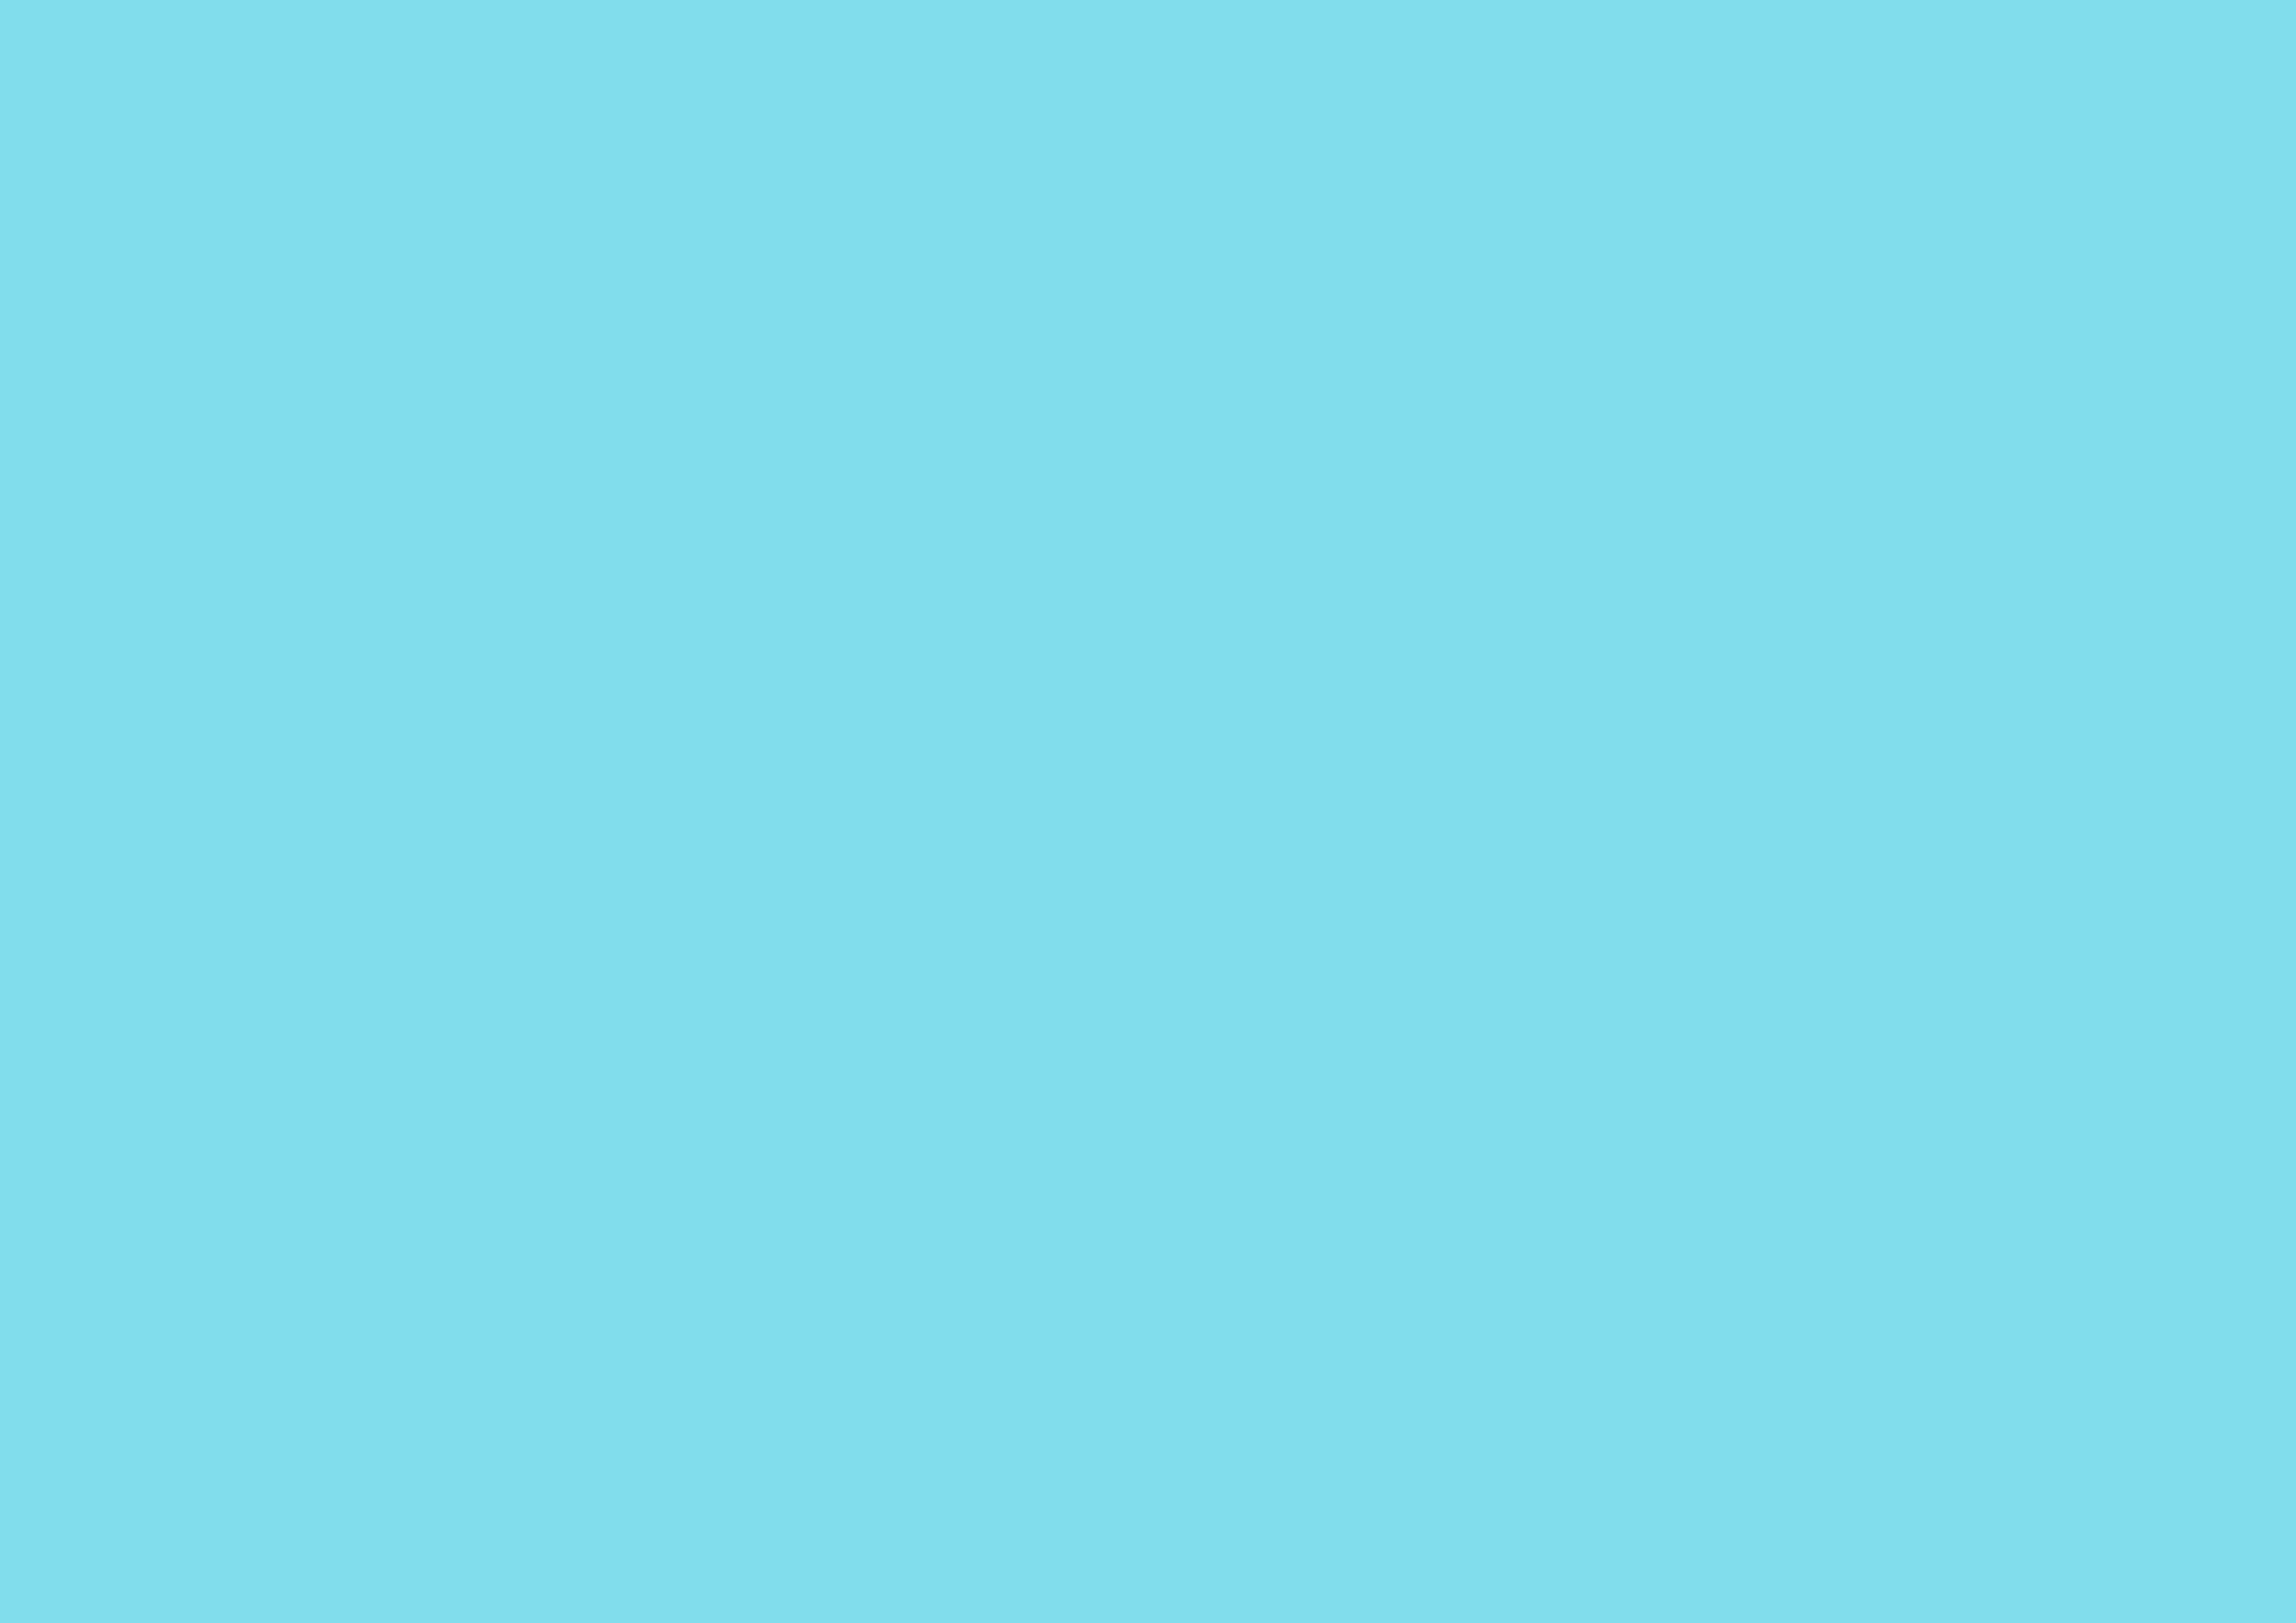 3508x2480 Medium Sky Blue Solid Color Background